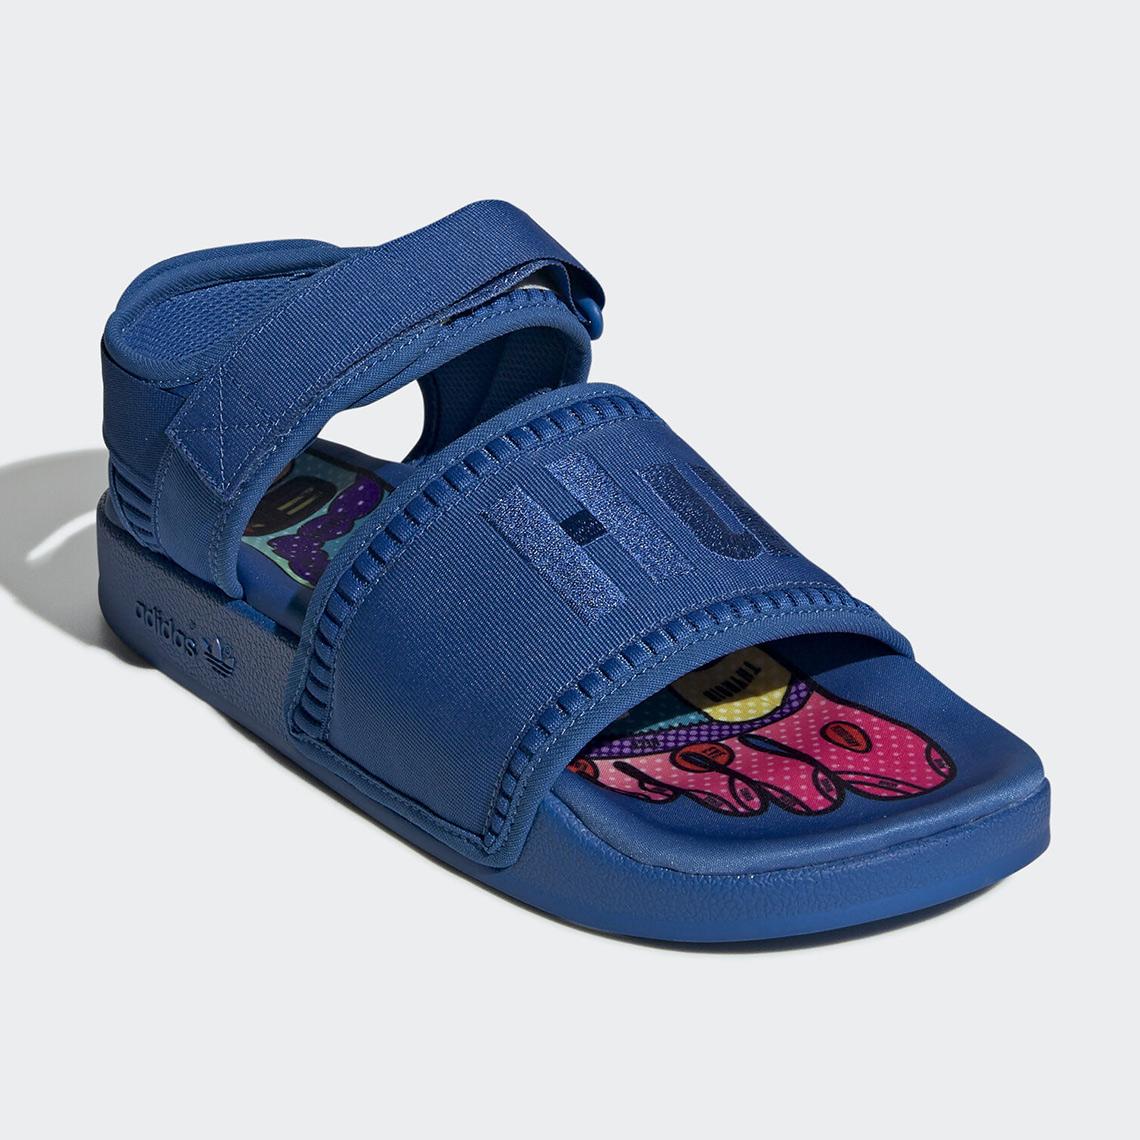 Pharrell adidas Adilette 2.0 Sandals Hu Release Date